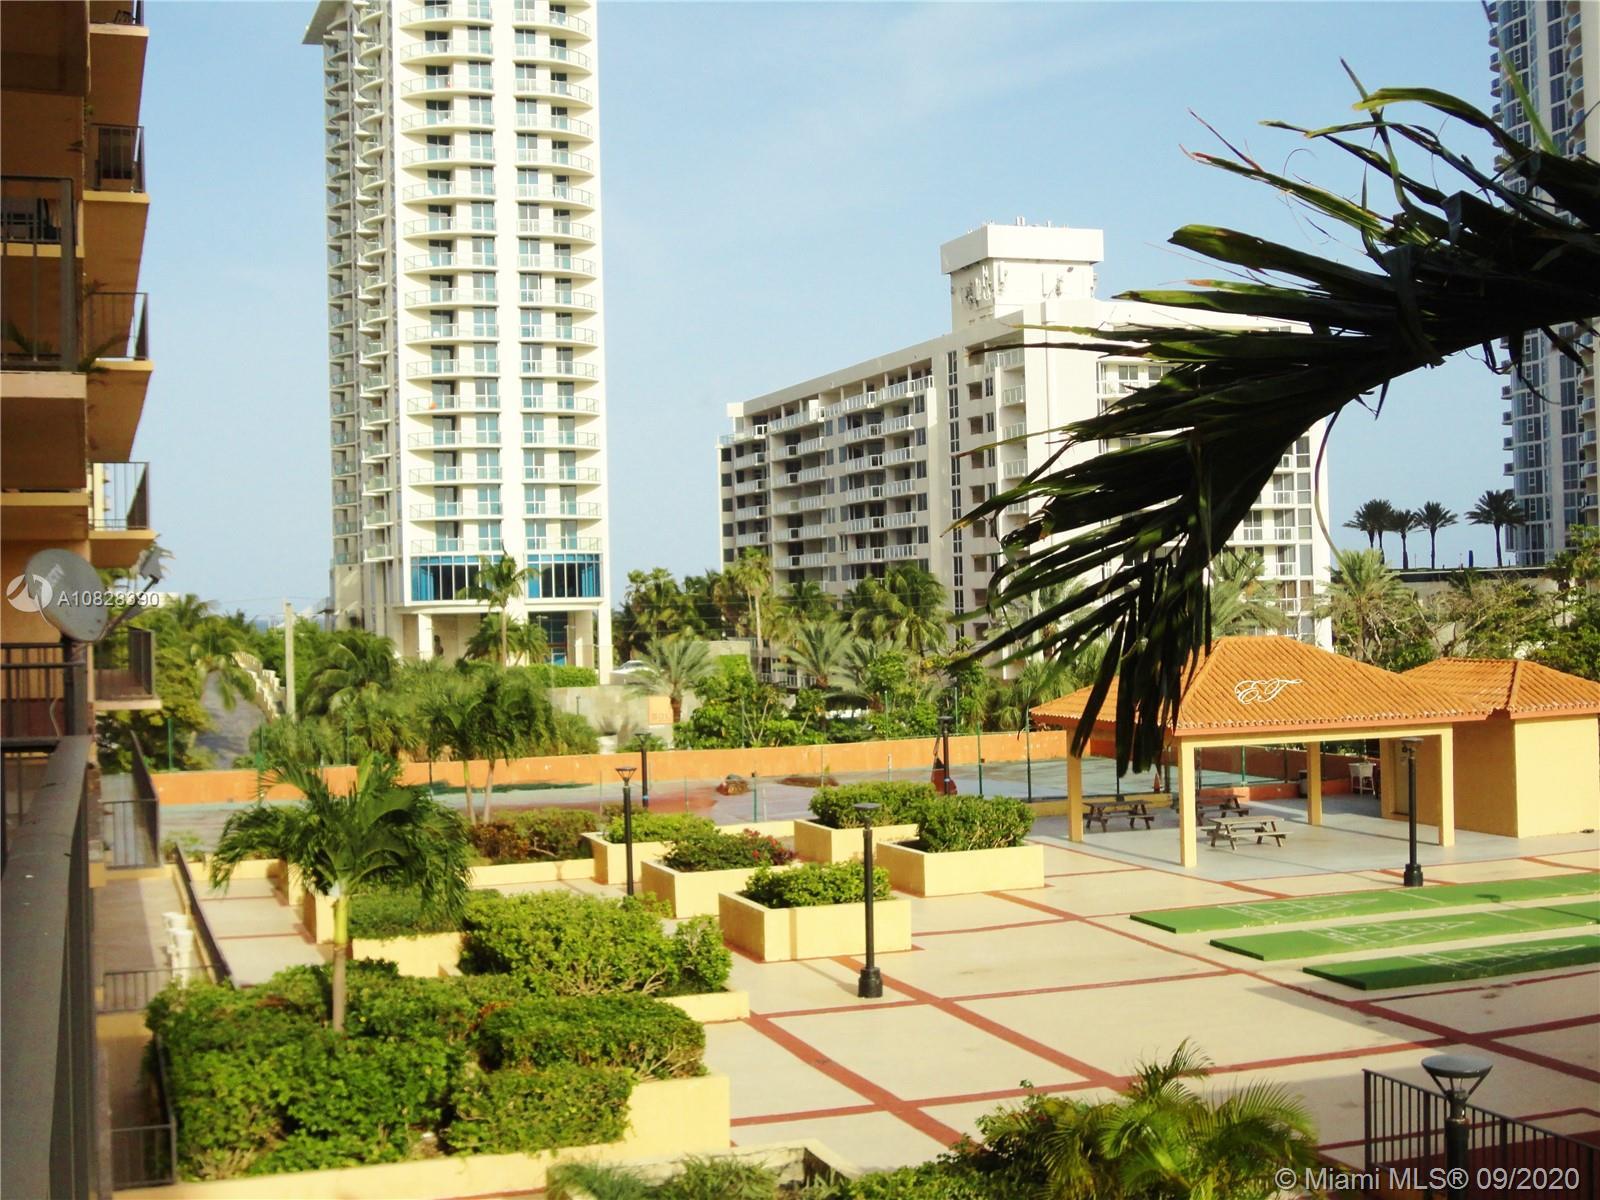 Winston Tower 600 #504 - 210 174 ST #504, Sunny Isles Beach, FL 33160